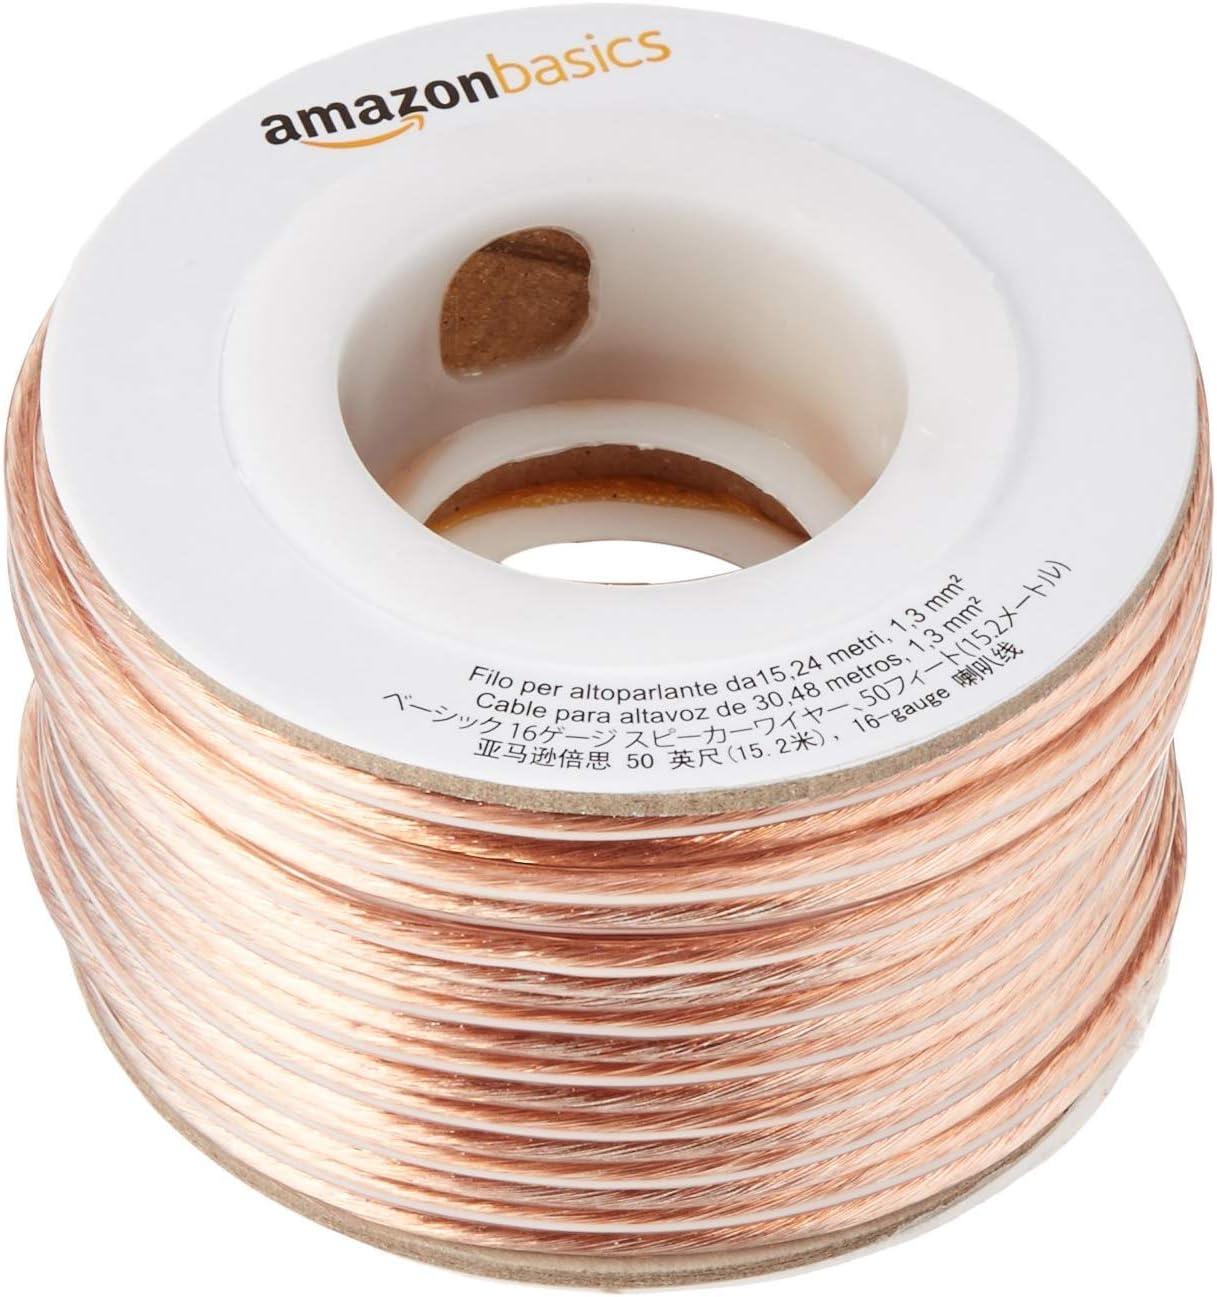 Amazon Basics 16 Gauge Speaker Wire 50 Feet Elektronik